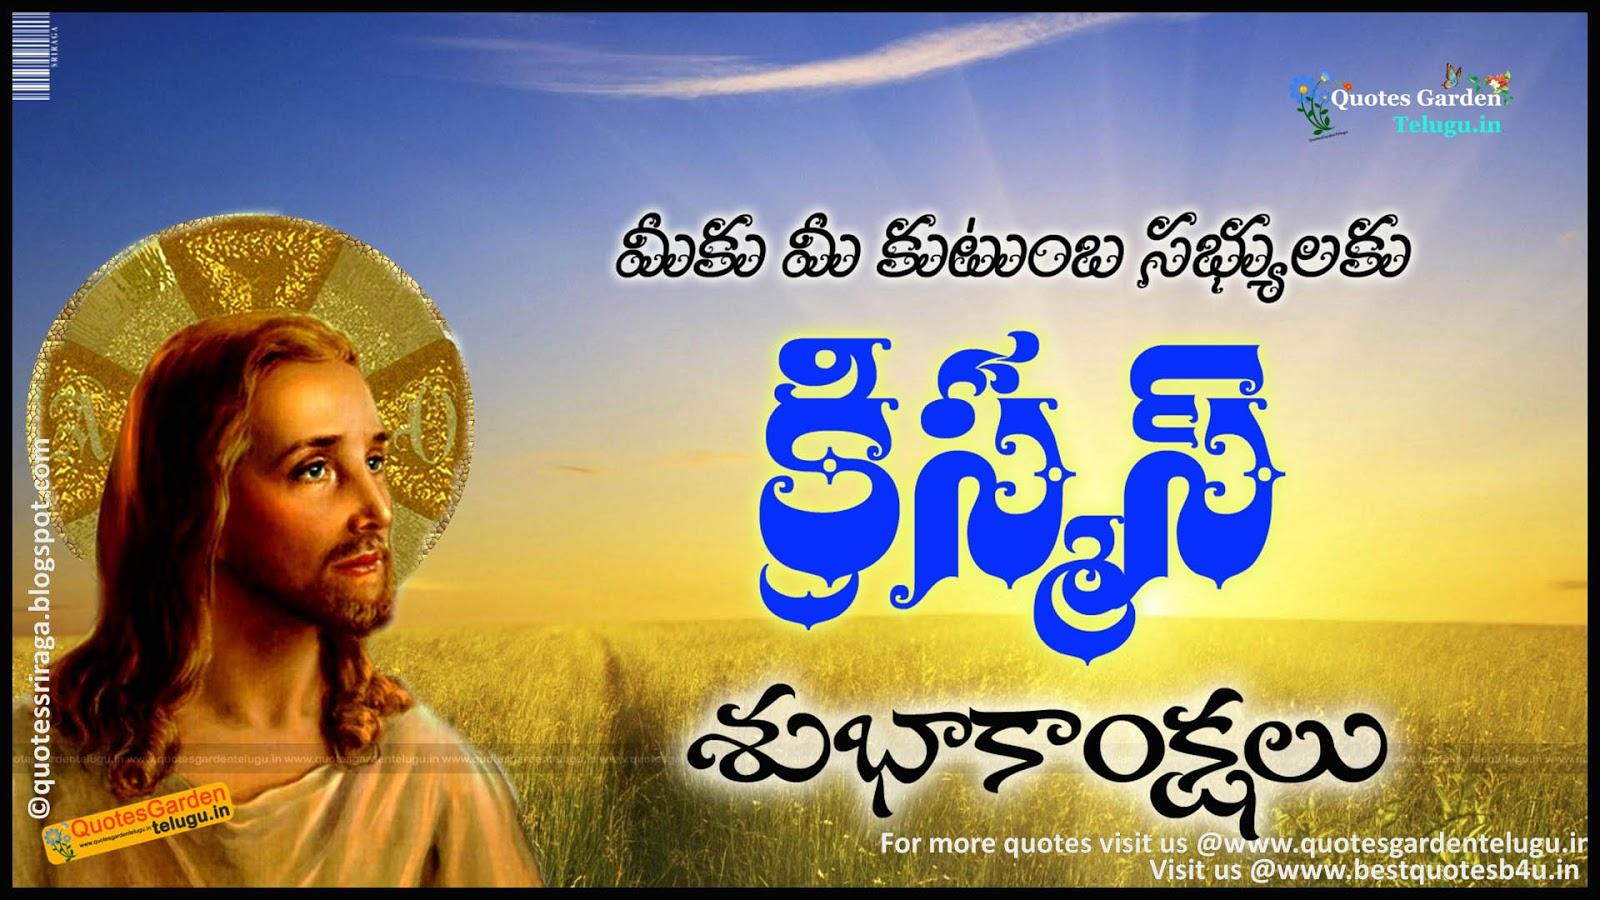 Best Telugu Christmas Greeting with jesus christ images